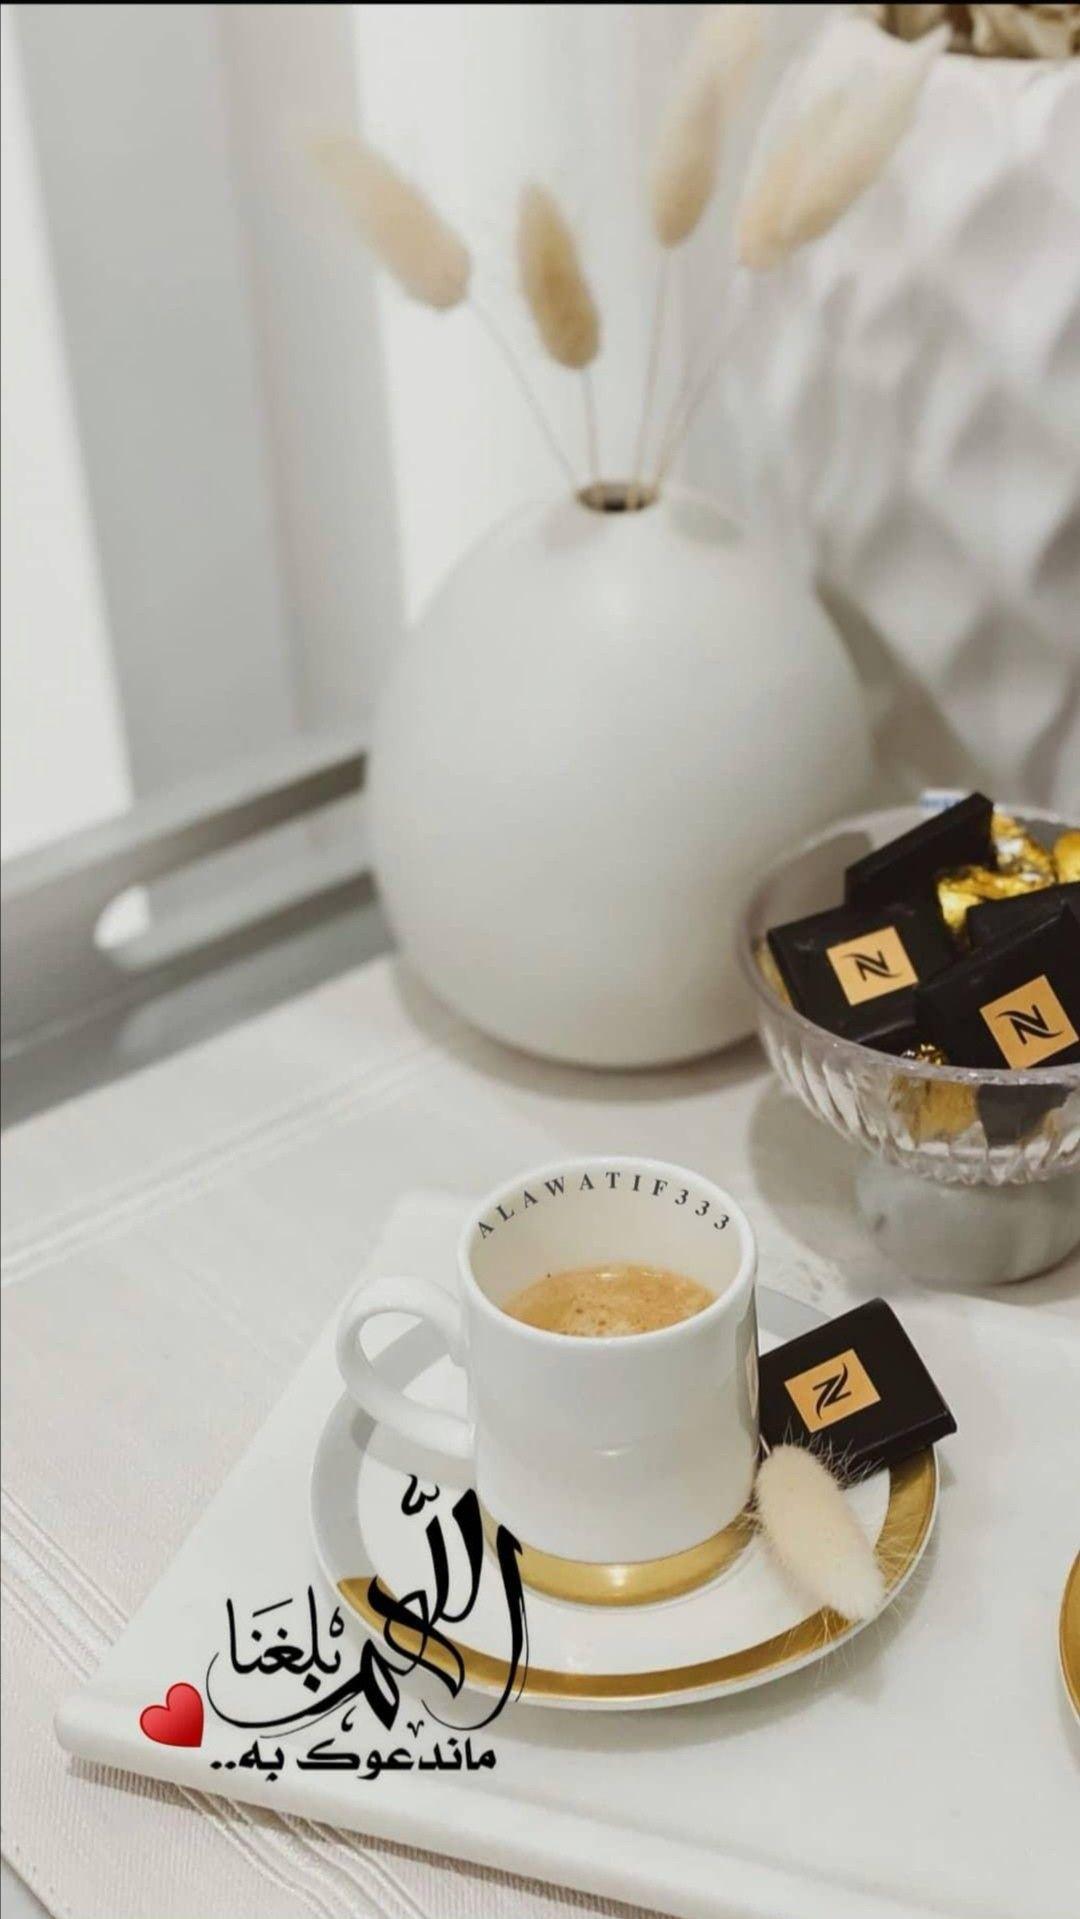 قهوة قهوه سبحان الله عواطف رمضان شهررمضان صباح الخير مساء النور الورد ورد جوري روز 𝐀𝐋𝐀𝐖𝐀𝐓𝐈𝐅𝟑𝟑𝟑 𝓐𝔀𝓪𝓽𝓲𝓯 Q Glassware Tableware Islamic Pictures